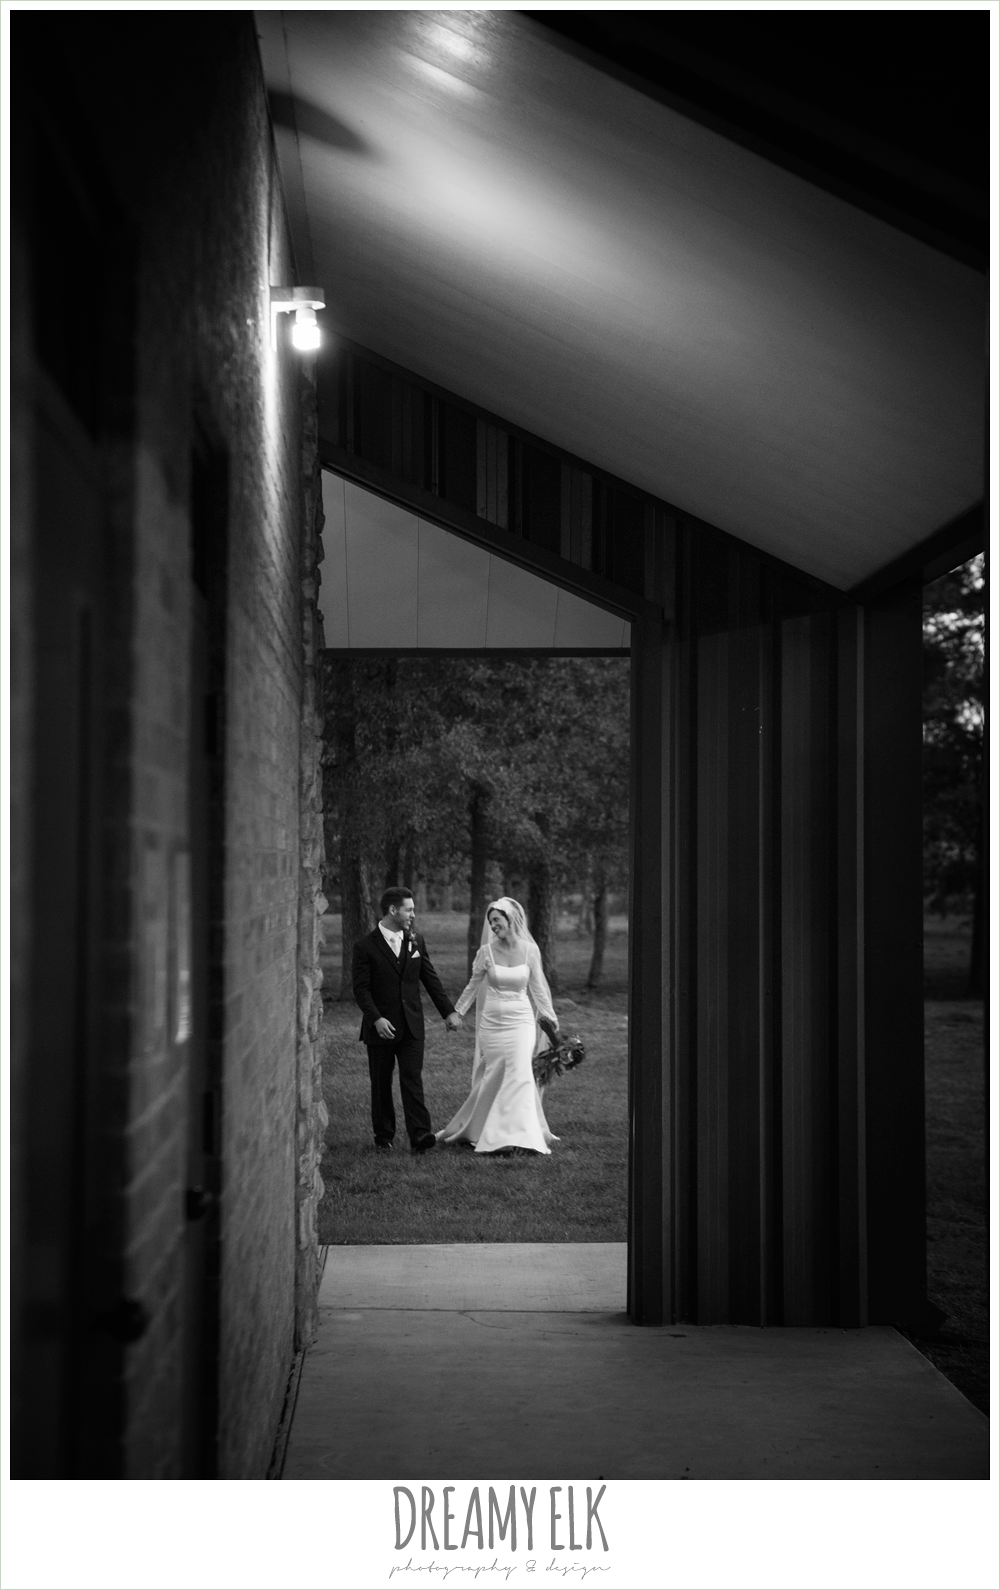 winter december church wedding photo {dreamy elk photography and design}